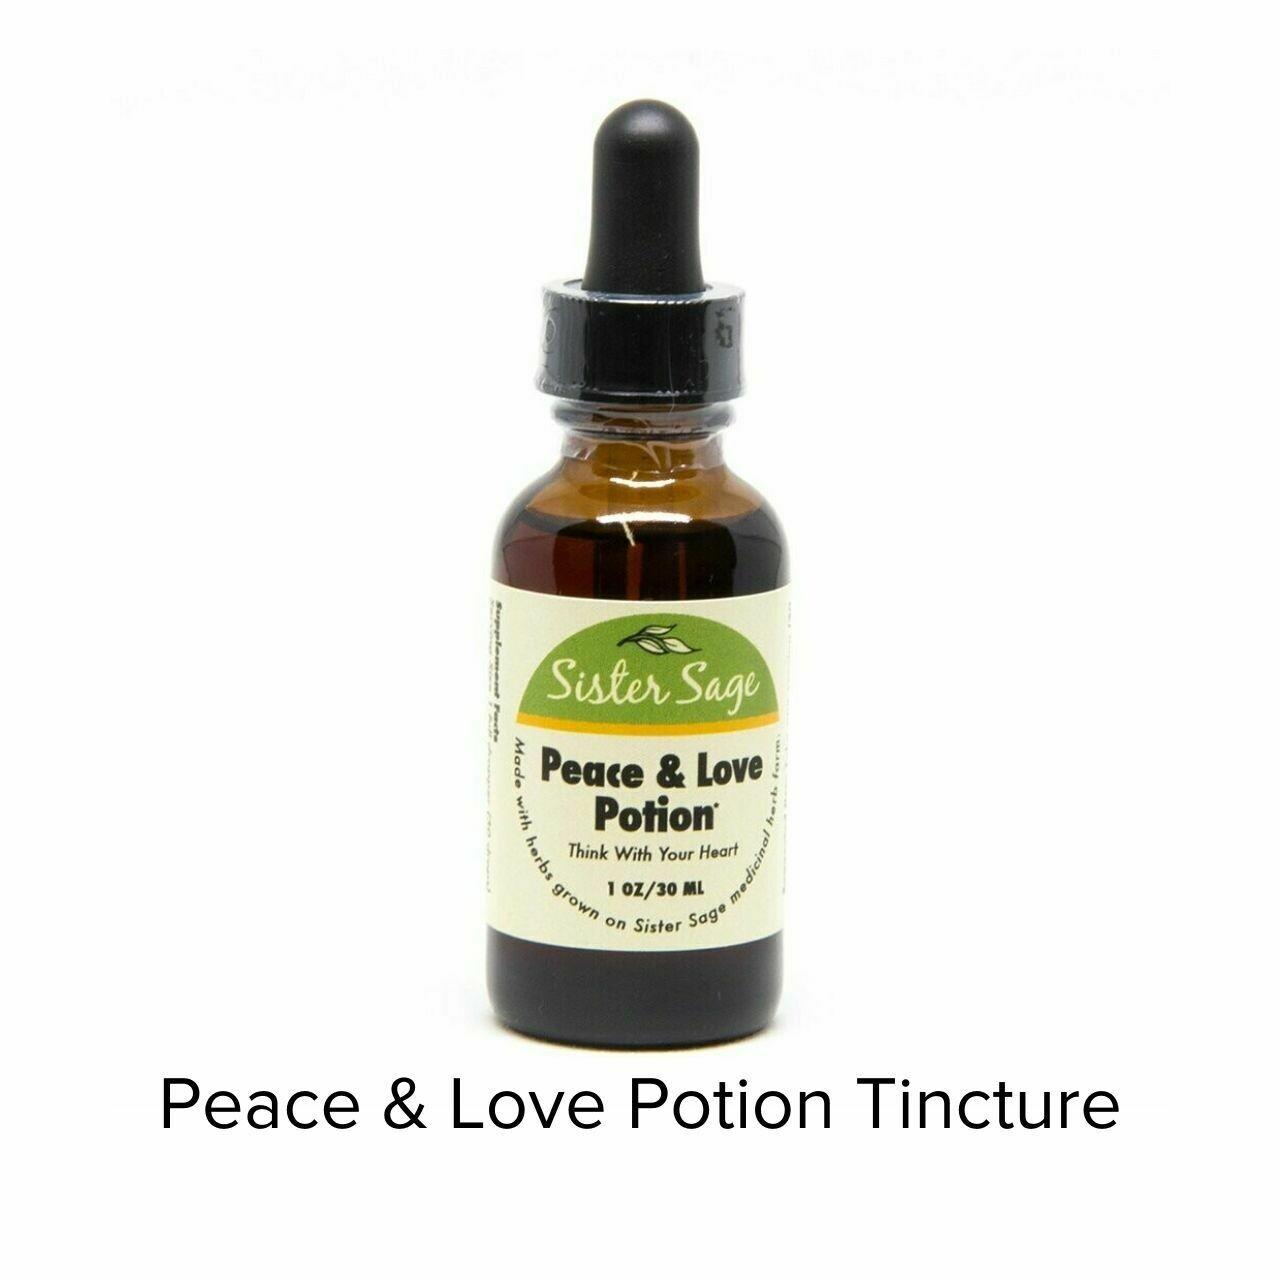 Sister Sage Peace Love Tincture